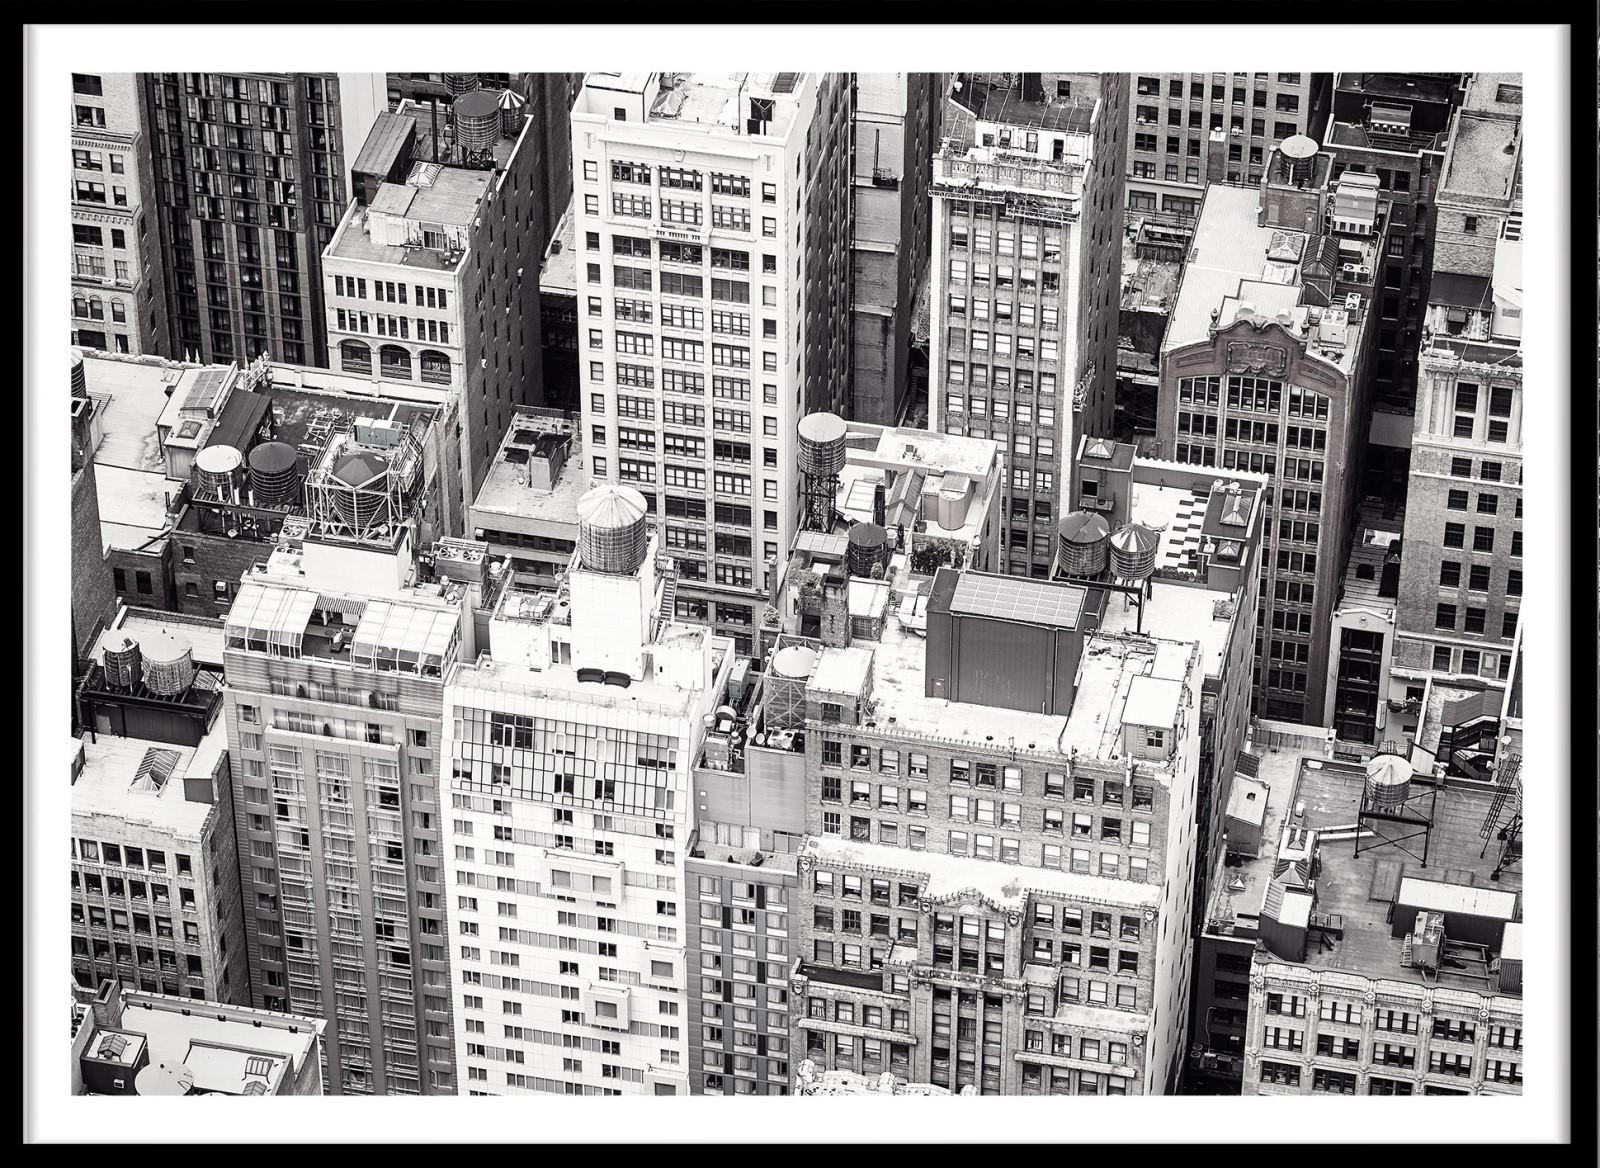 Ville - New York, Vintage